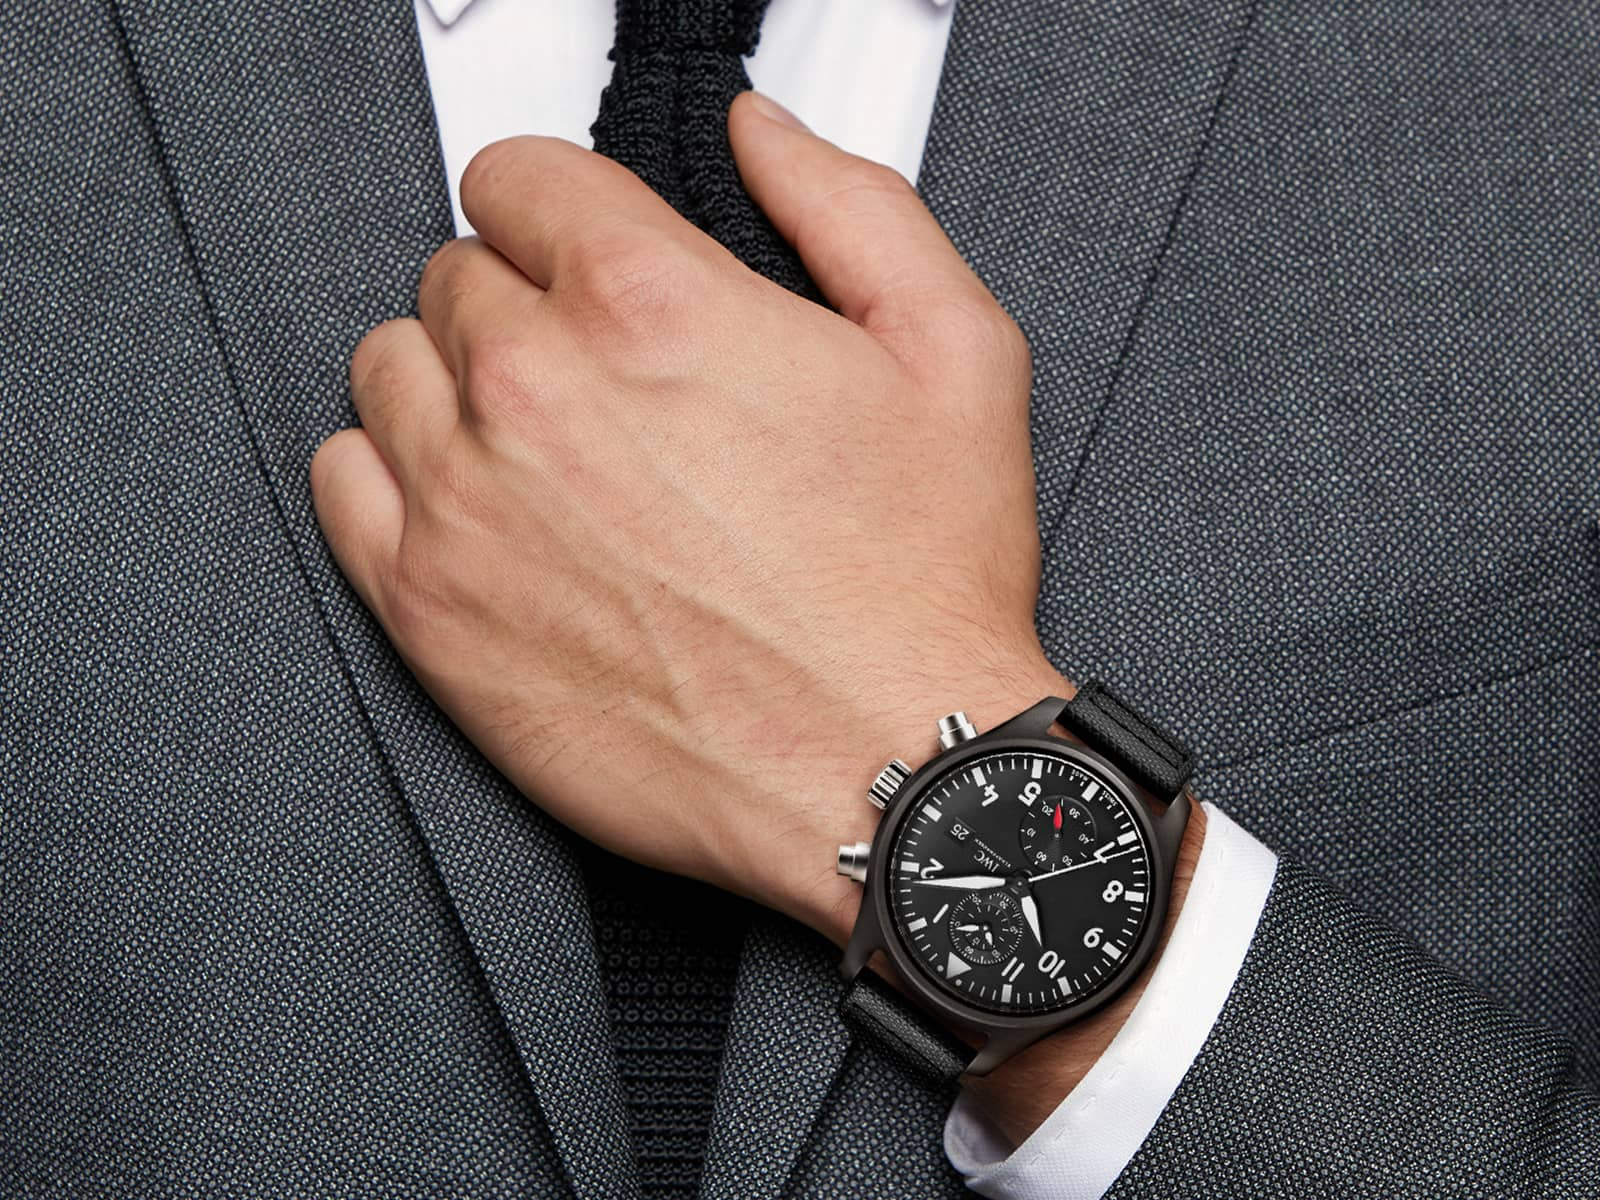 iw389001-iwc-pilot-s-watch-chronograph-top-gun-2-.jpg